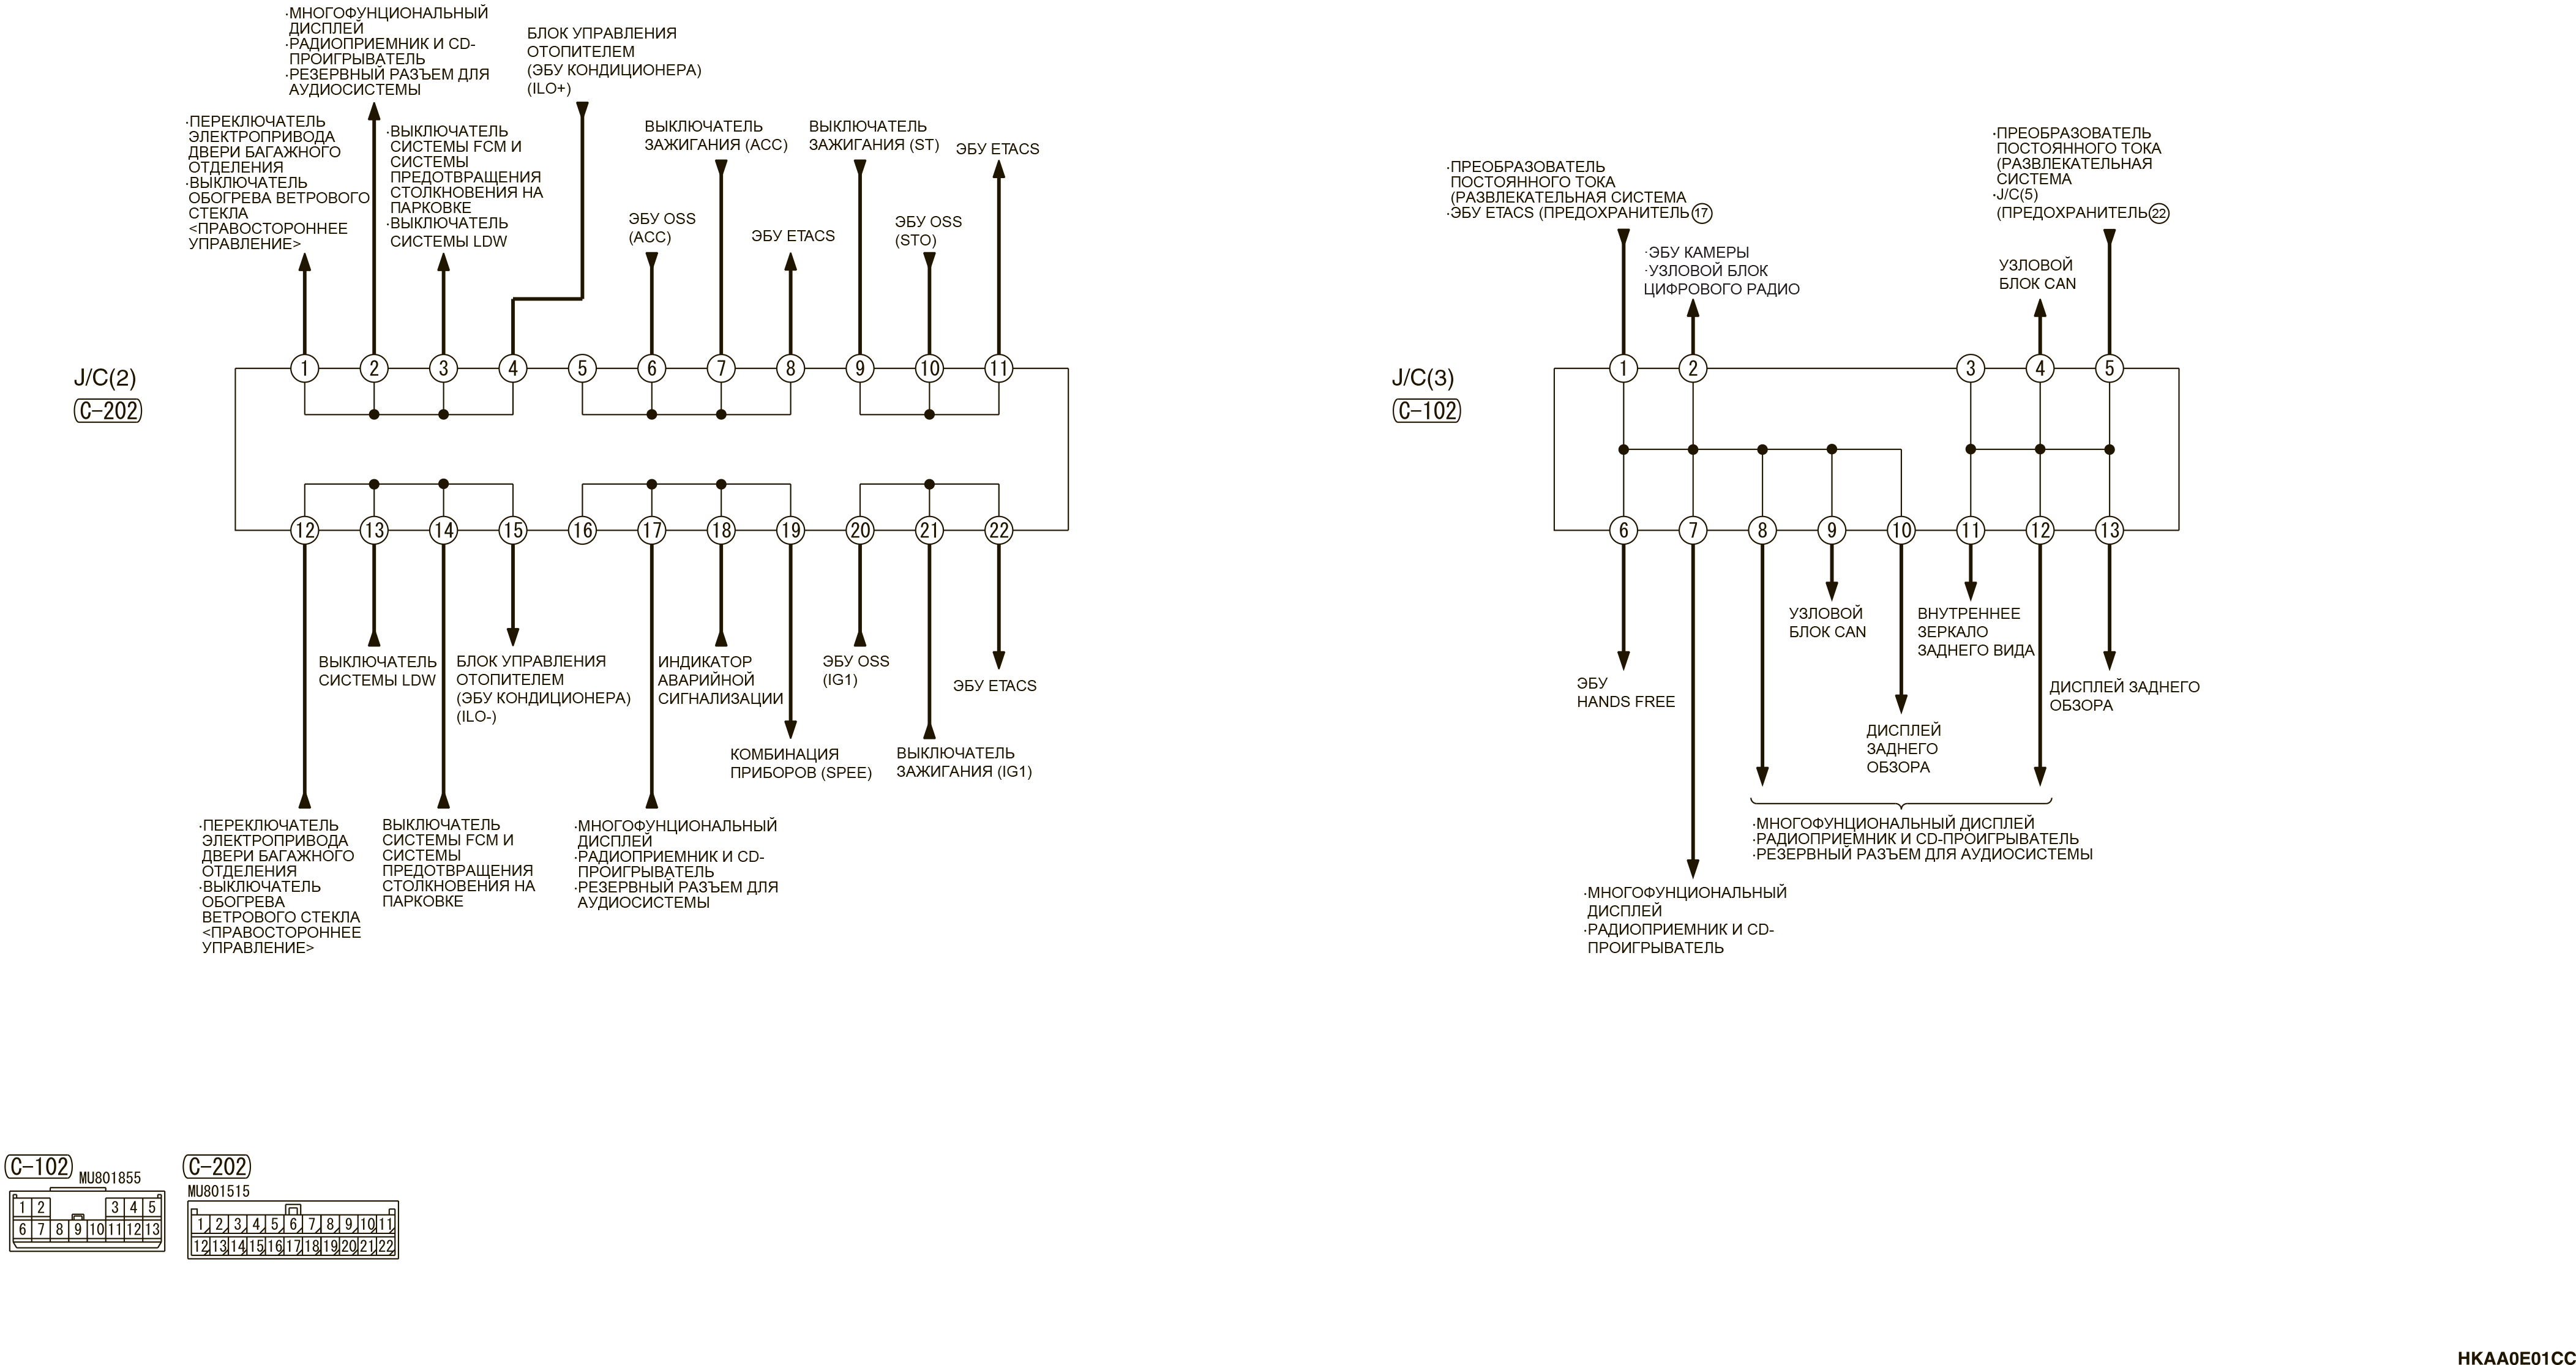 mmc аутлендер 3 2019 электросхемаJ/C